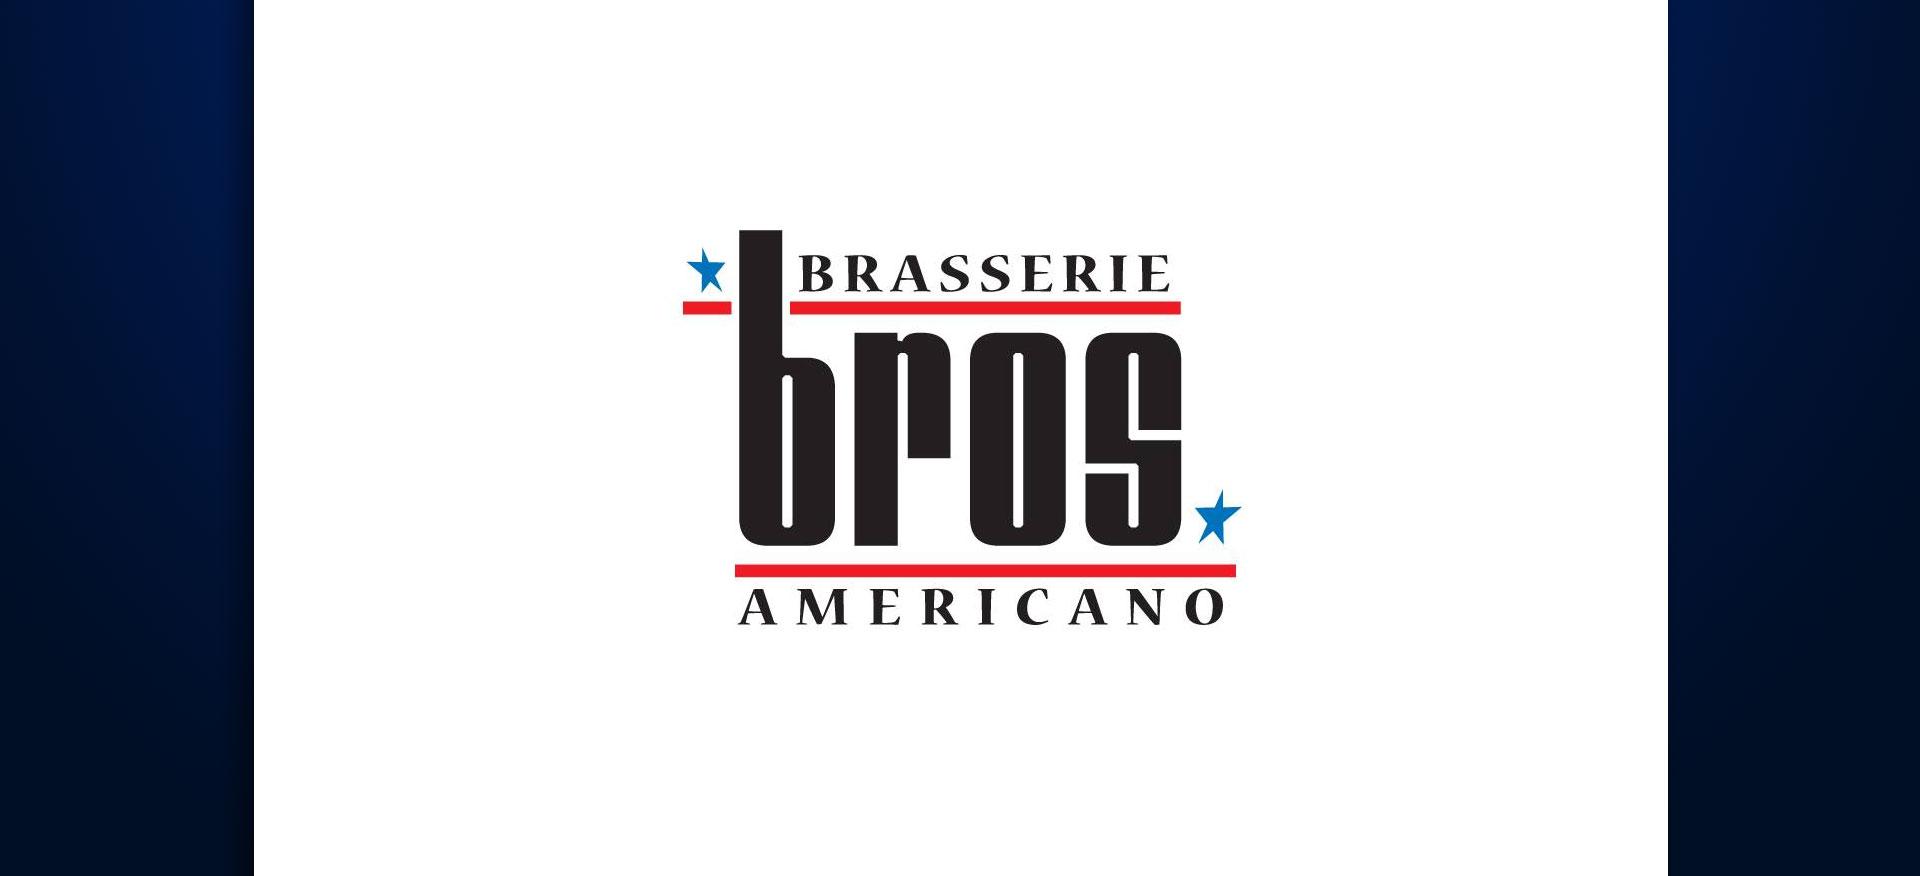 Bros restaurant logo Sioux Falls